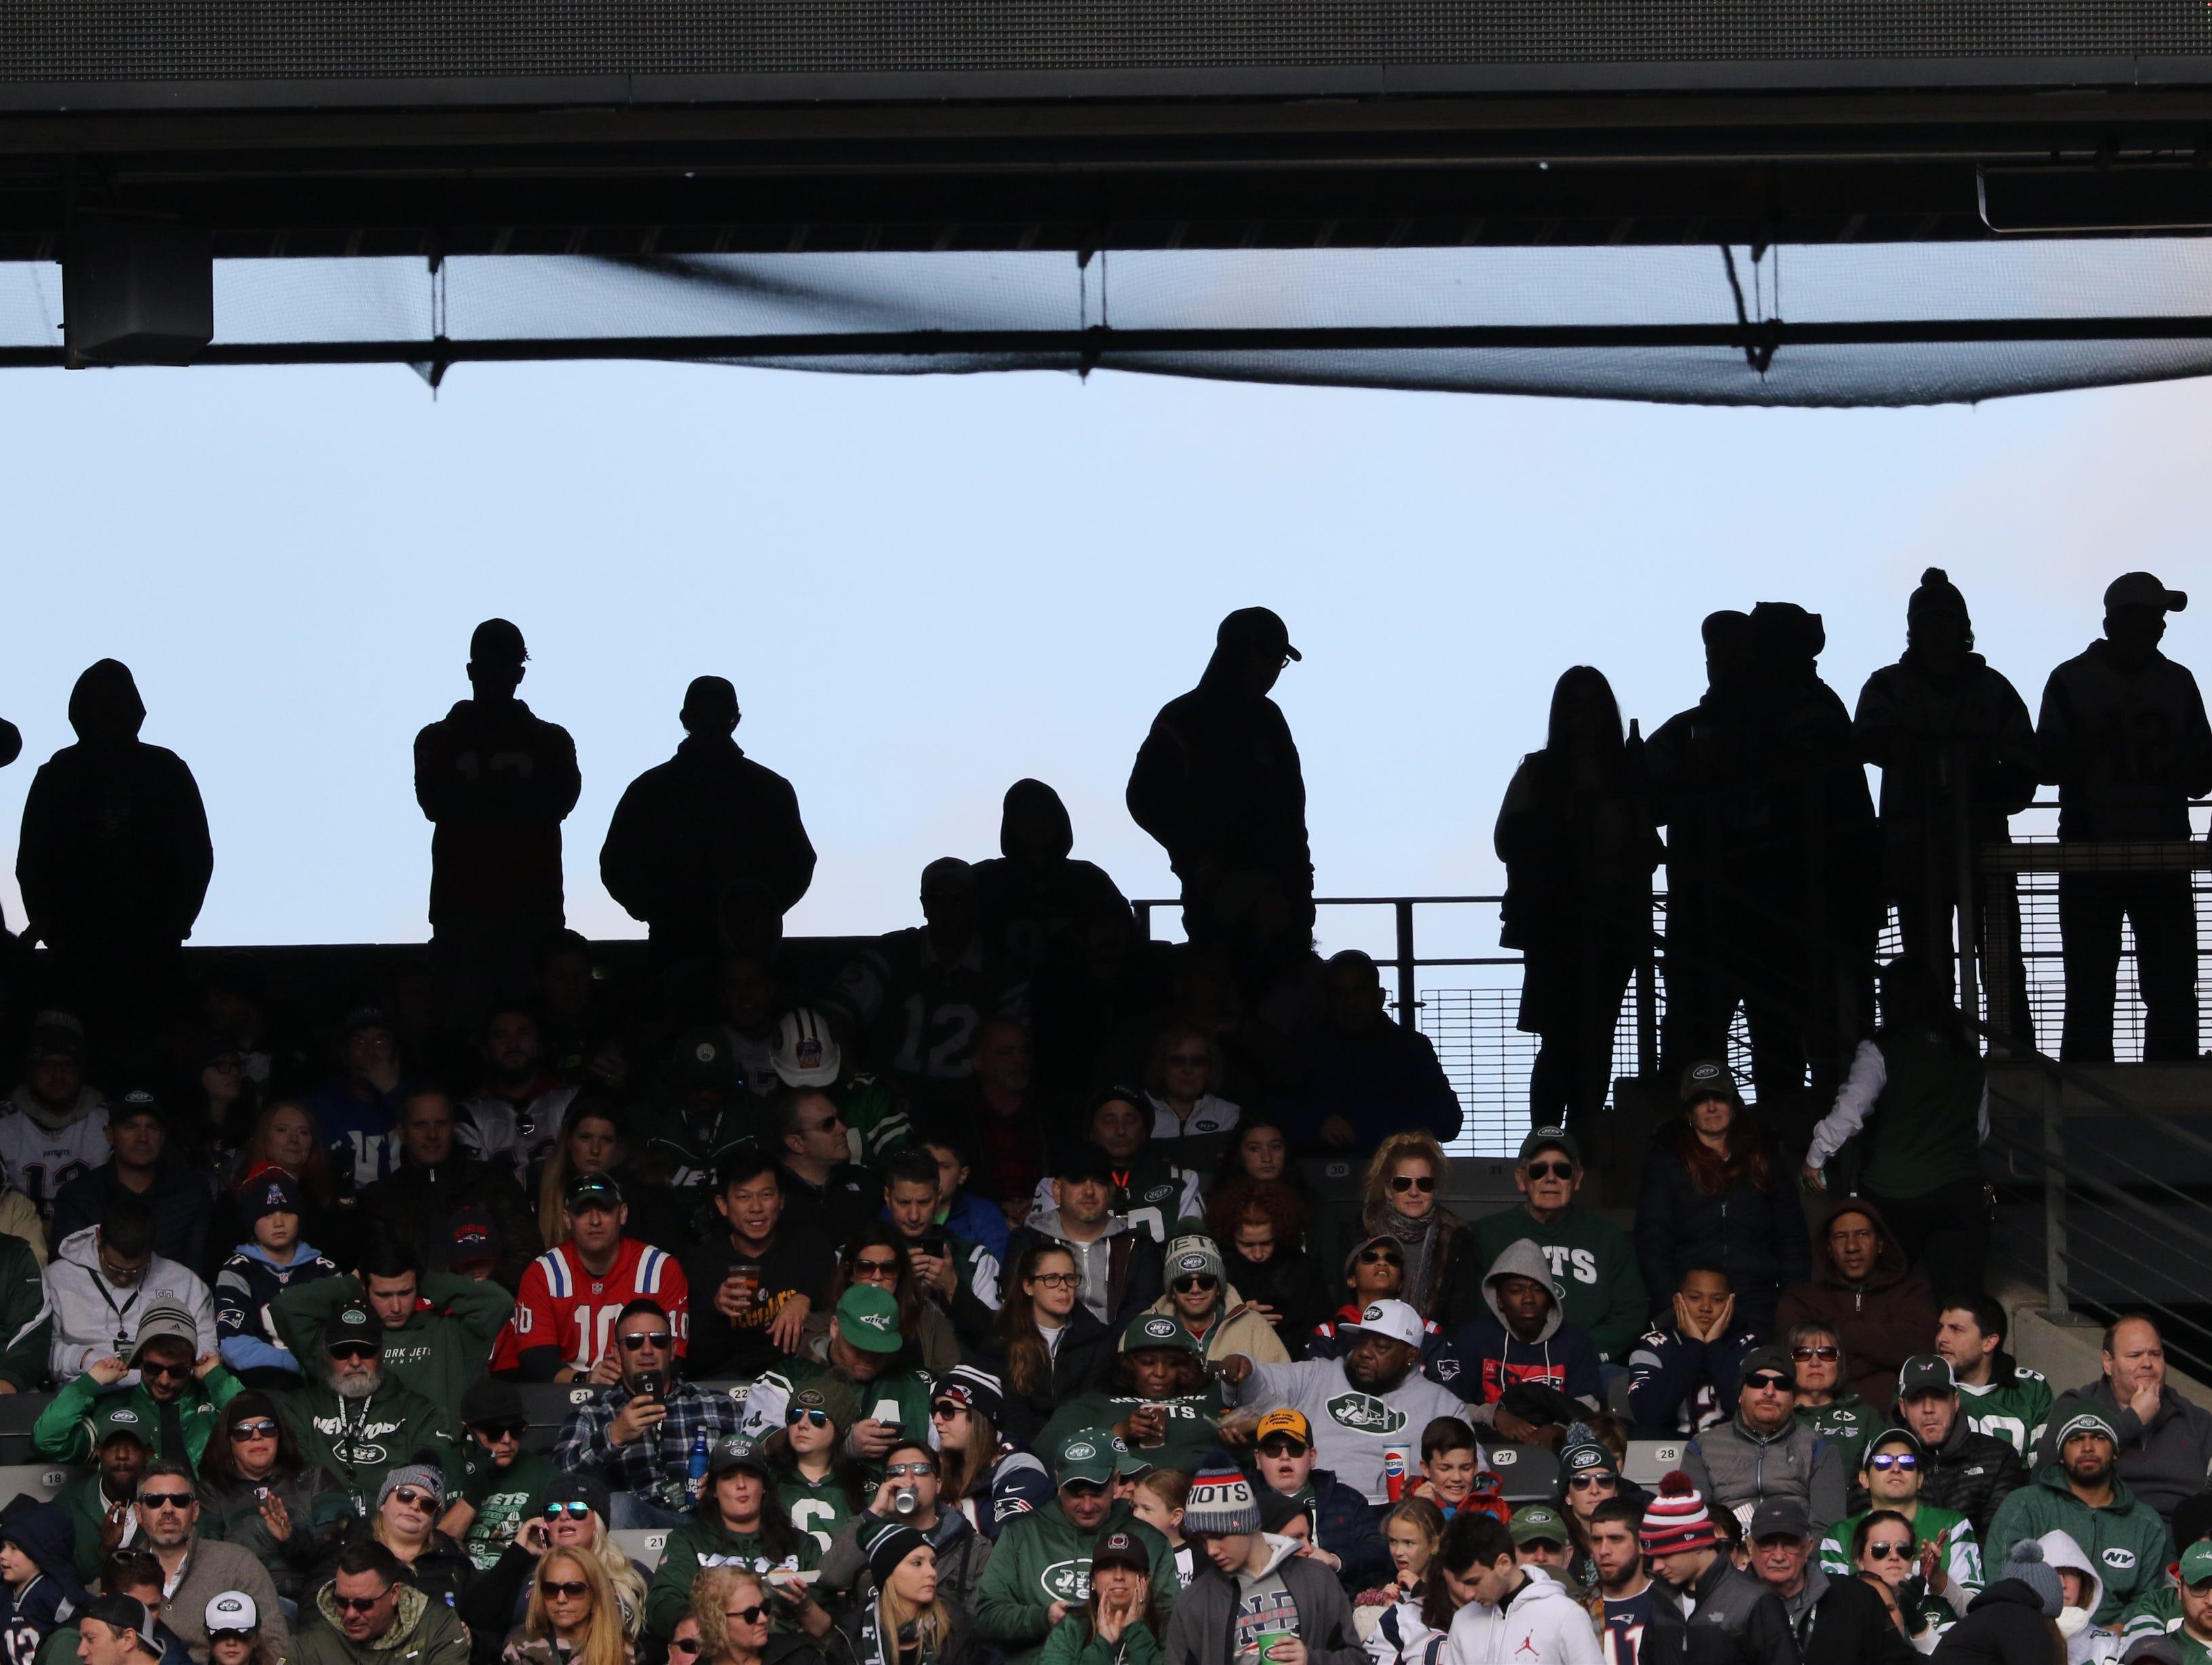 Football fans pack MetLife Stadium for Week 12 of the NFL season. Sunday, November 25, 2018